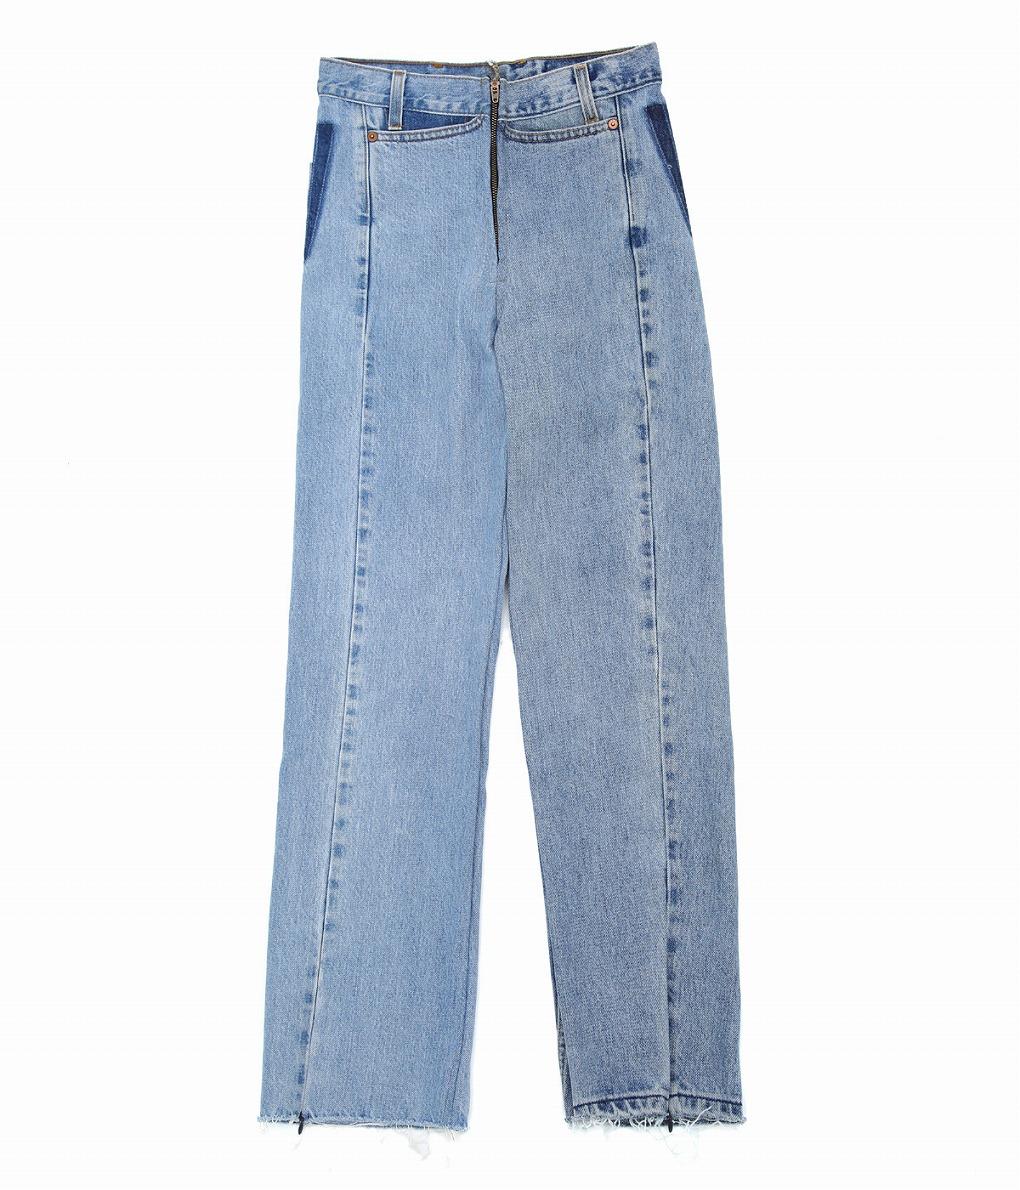 77circa / ナナナナサーカ : 【別注】circa make cut off rotated 90° denim pants(length 105) -26inch- : 別注 サーカ メイク カットオフ デニムパンツ パンツ レディース : cc-ak01-BLU-26-01 【ANN】